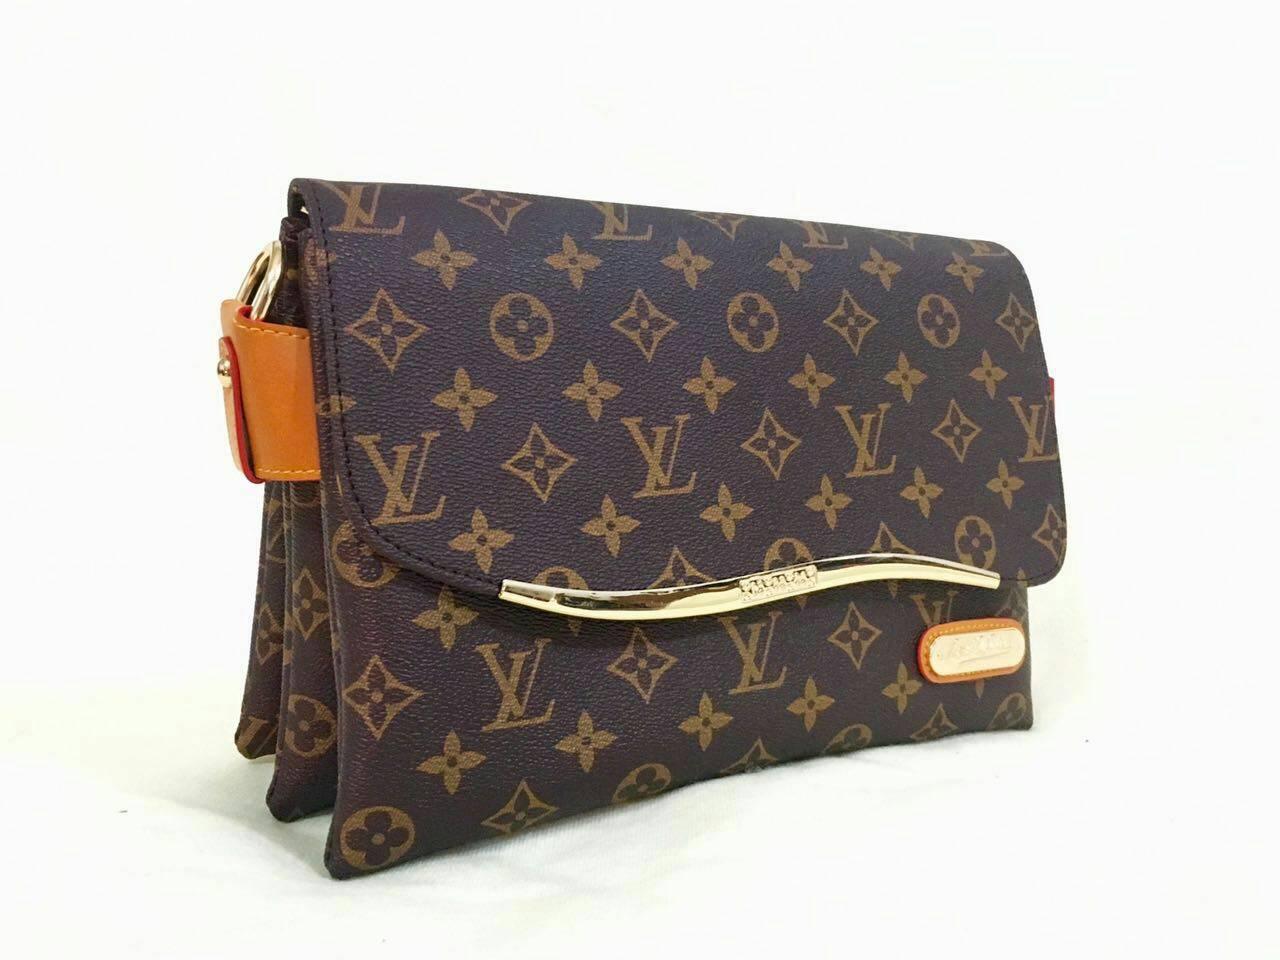 ... Tas Selempang Wanita Lv Tas Branded Louis Vuitton Mono Damier -  Blanja.com b7180955a9